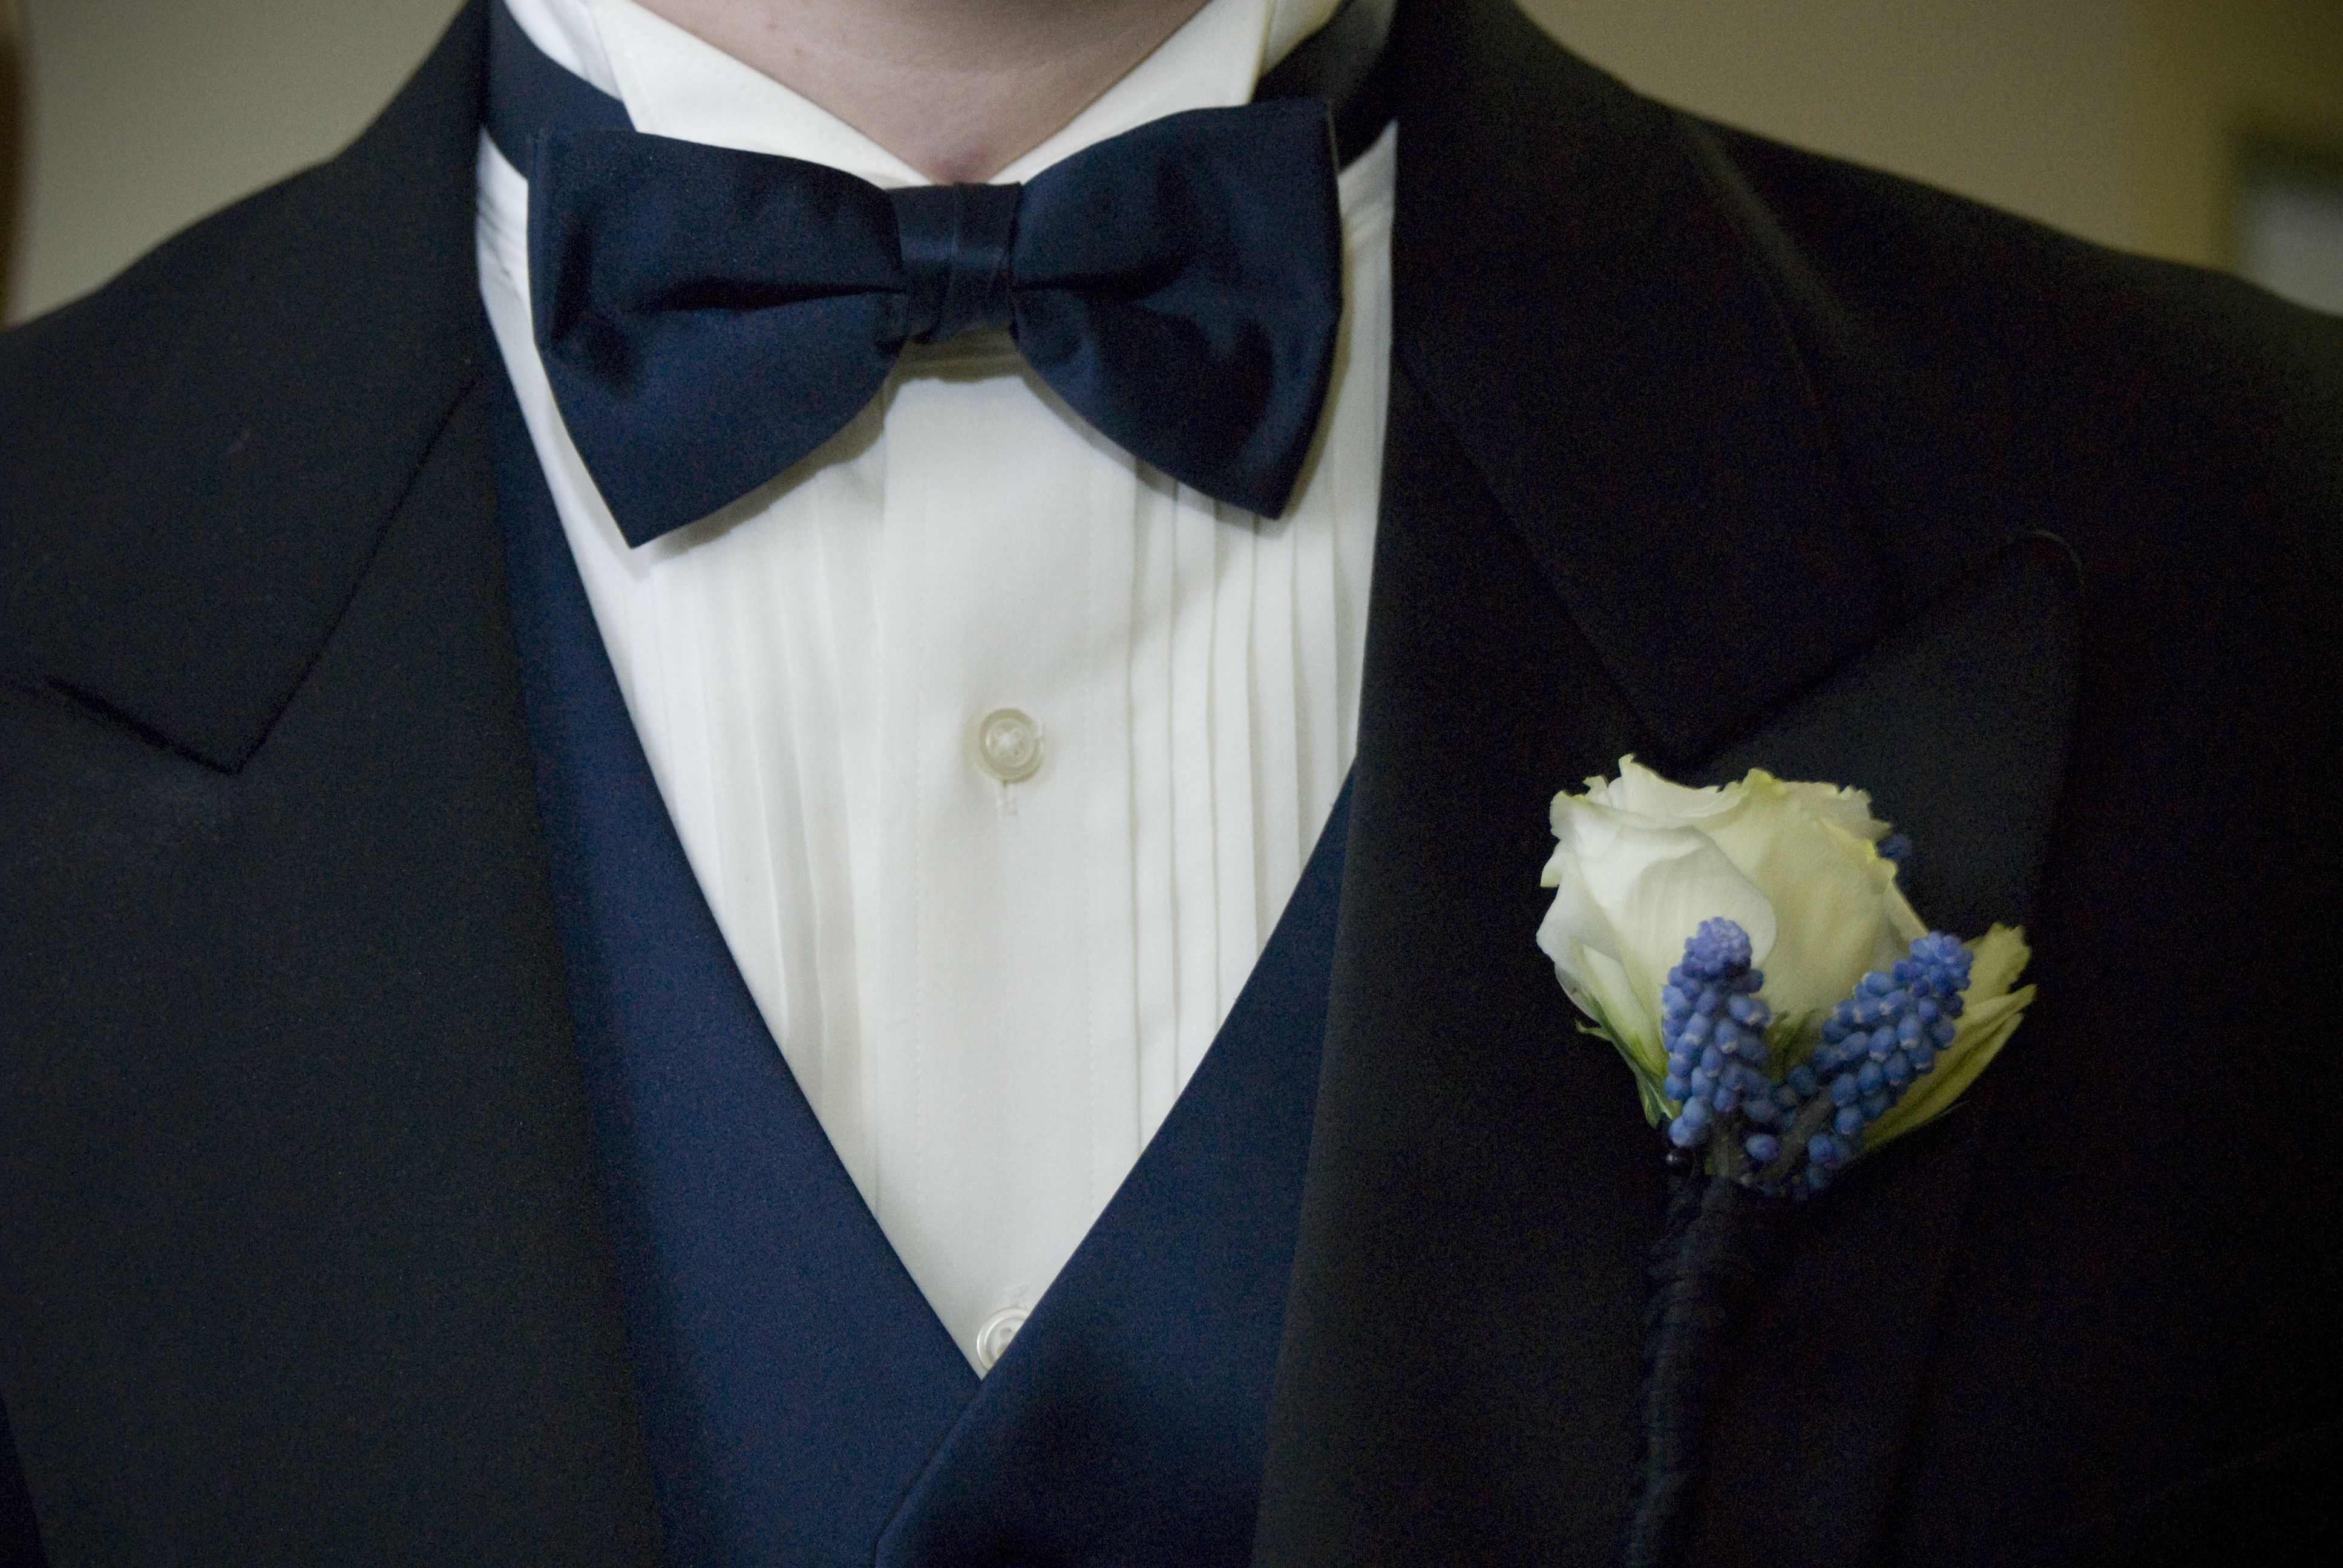 New Vesuvio Napoli Men/'s Polyester Ascot Cravat Necktie Hankie Paisley Grape